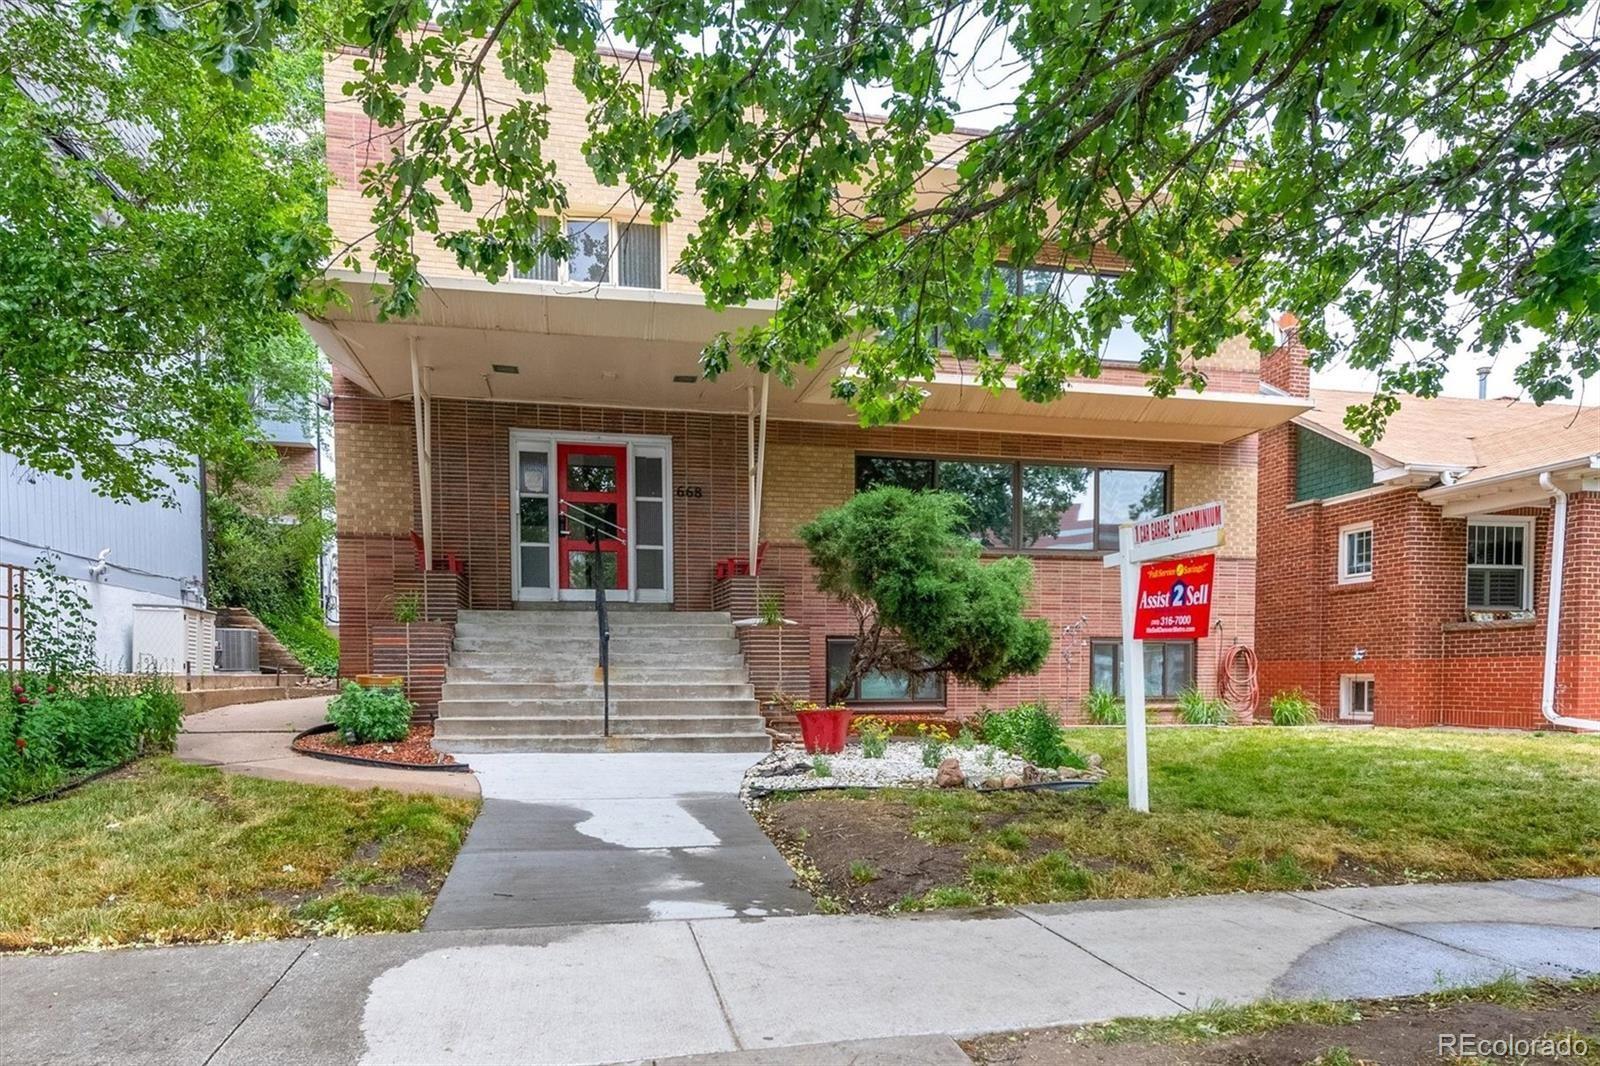 Photo of 668 N Pennsylvania Street #3, Denver, CO 80203 (MLS # 2290294)